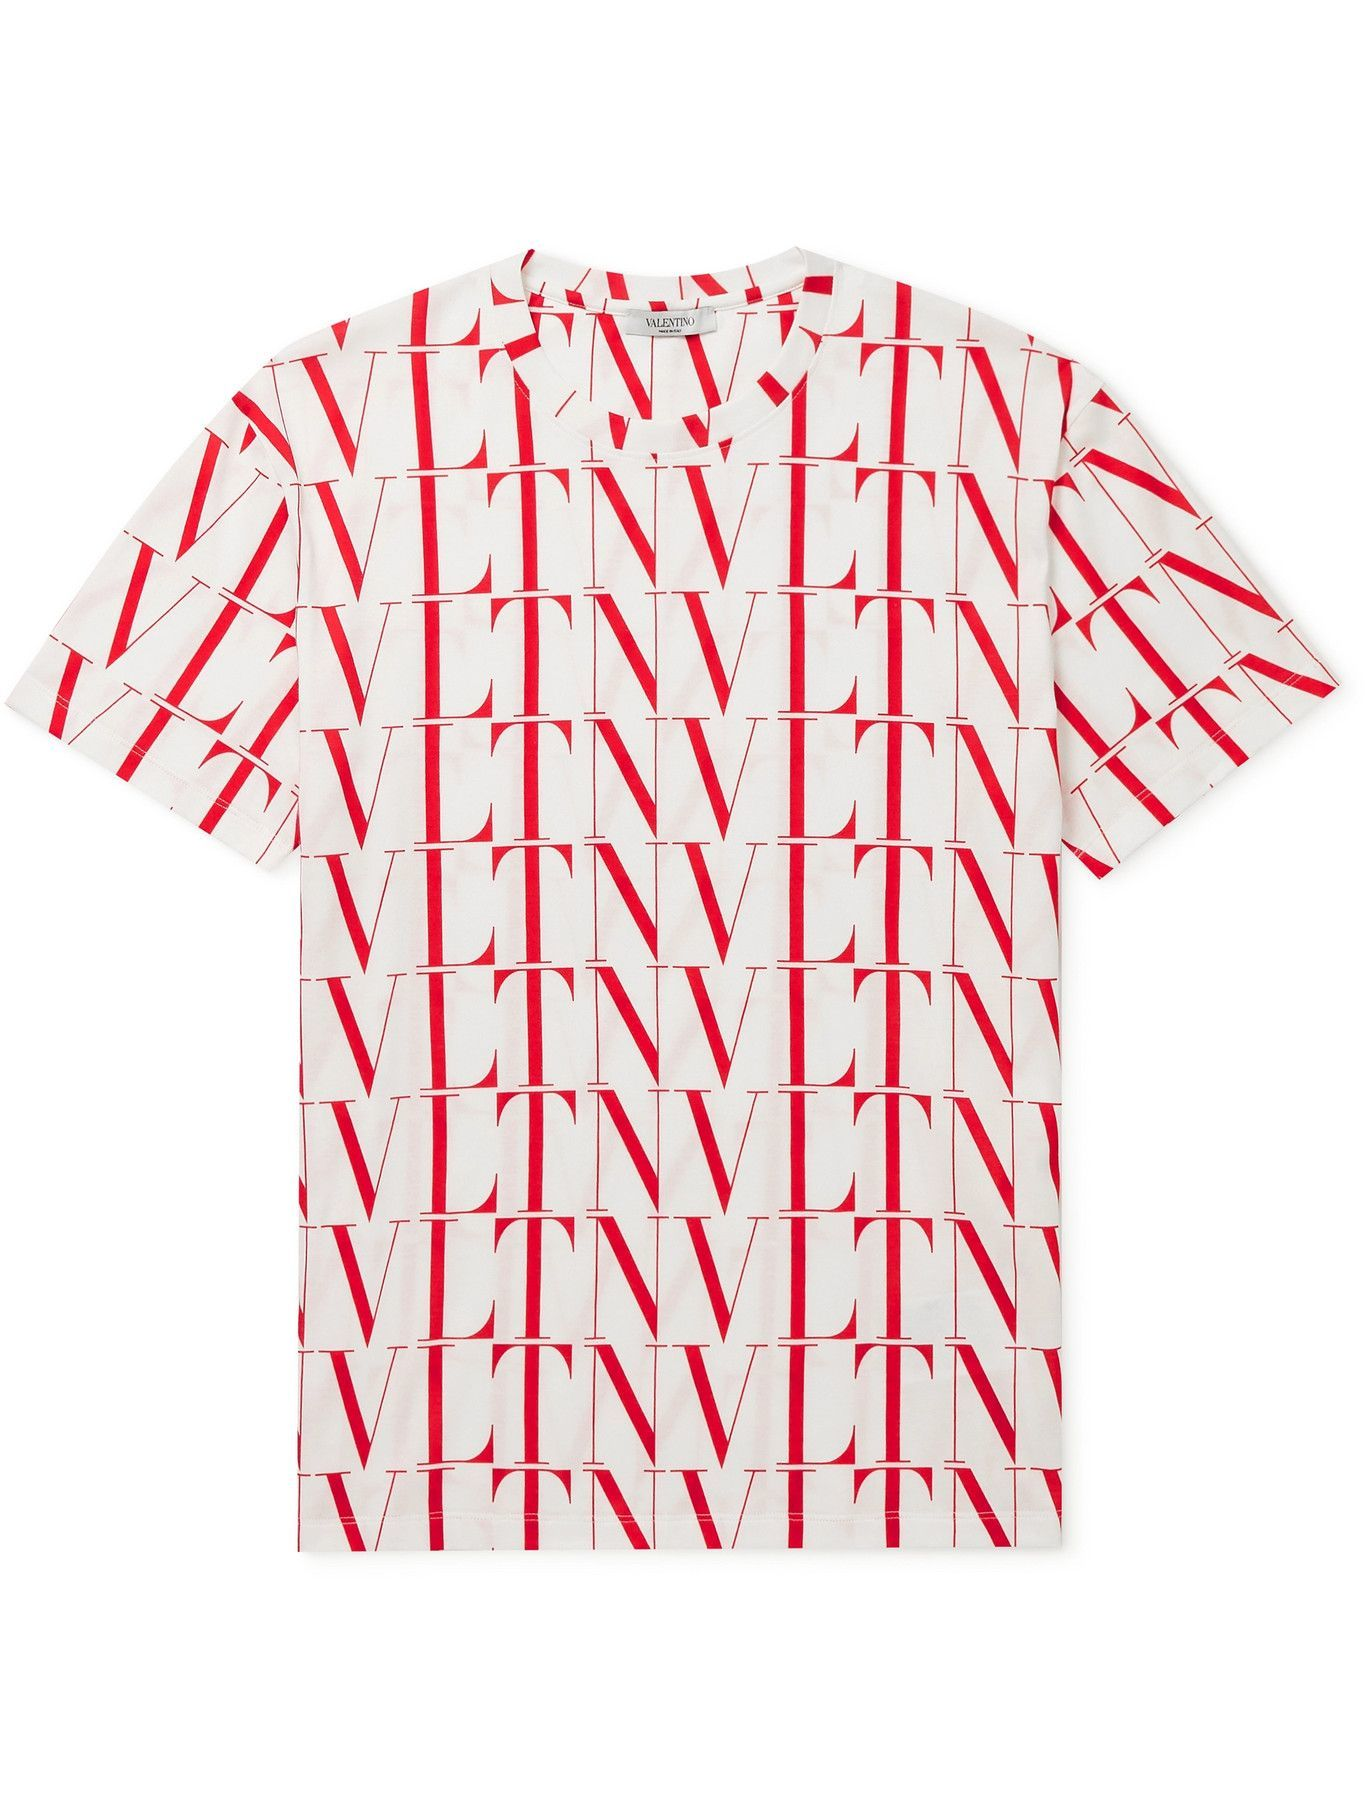 Photo: VALENTINO - Logo-Print Cotton-Jersey T-Shirt - Multi